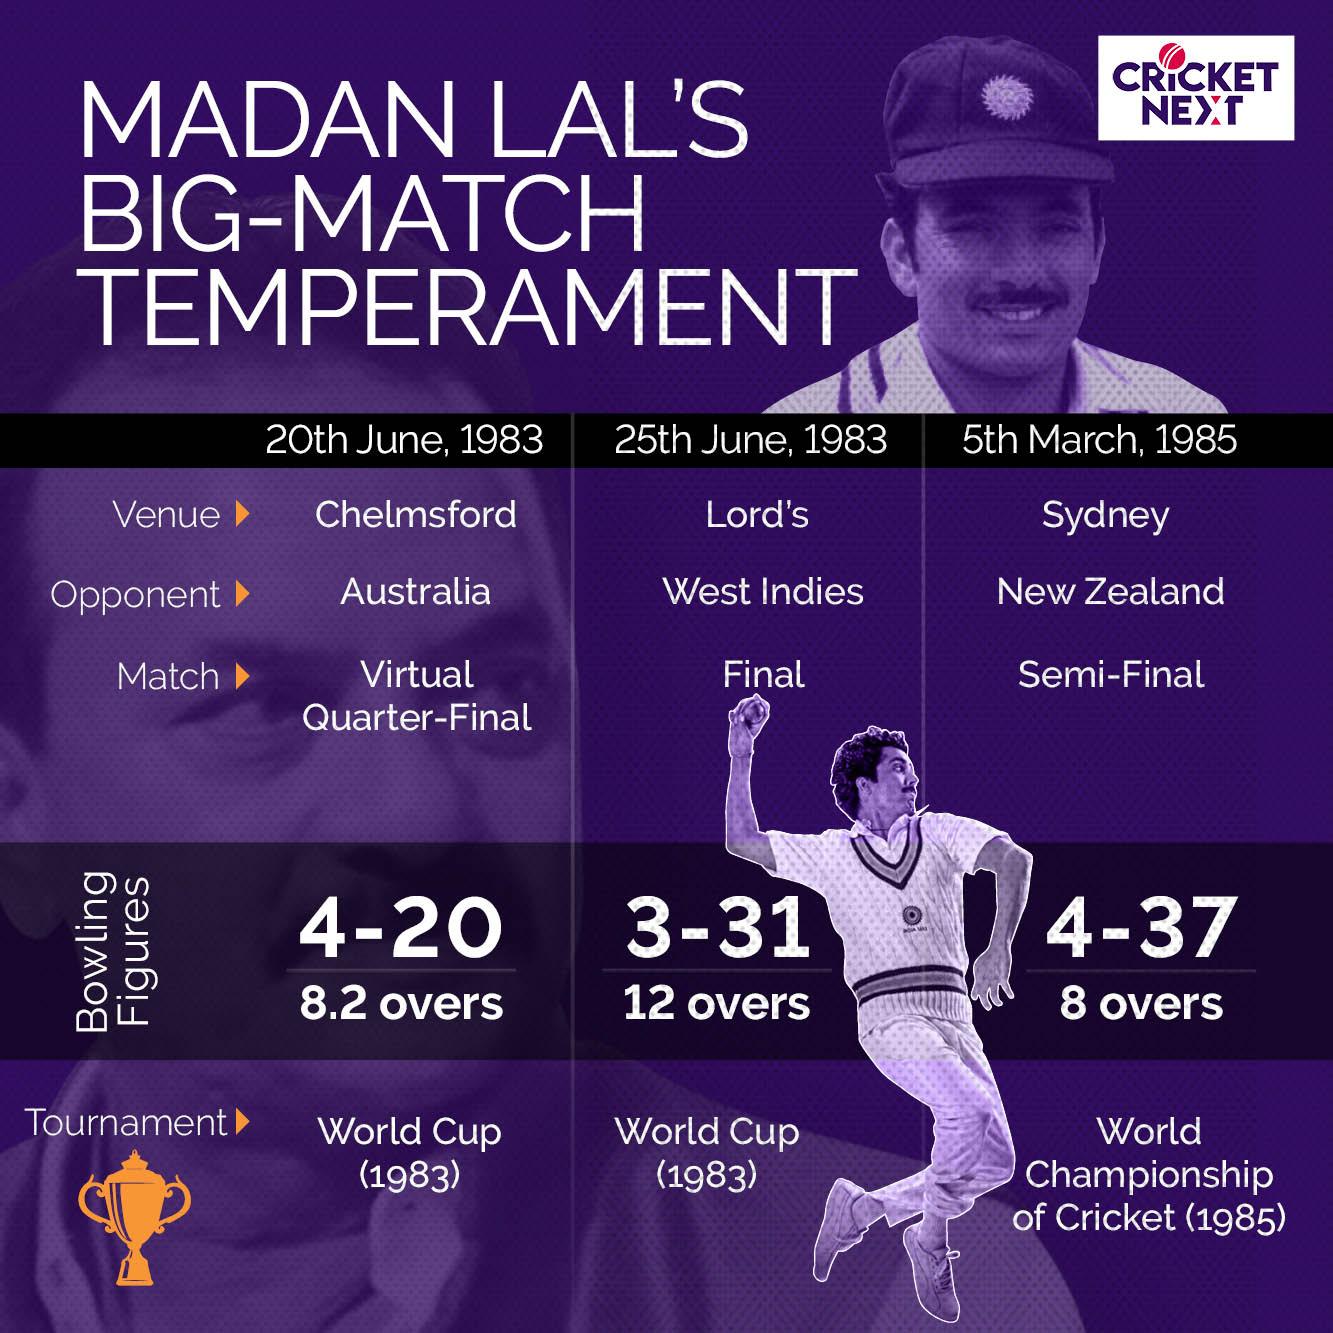 MADAN LAL - 1983 WORLD CUP - 2